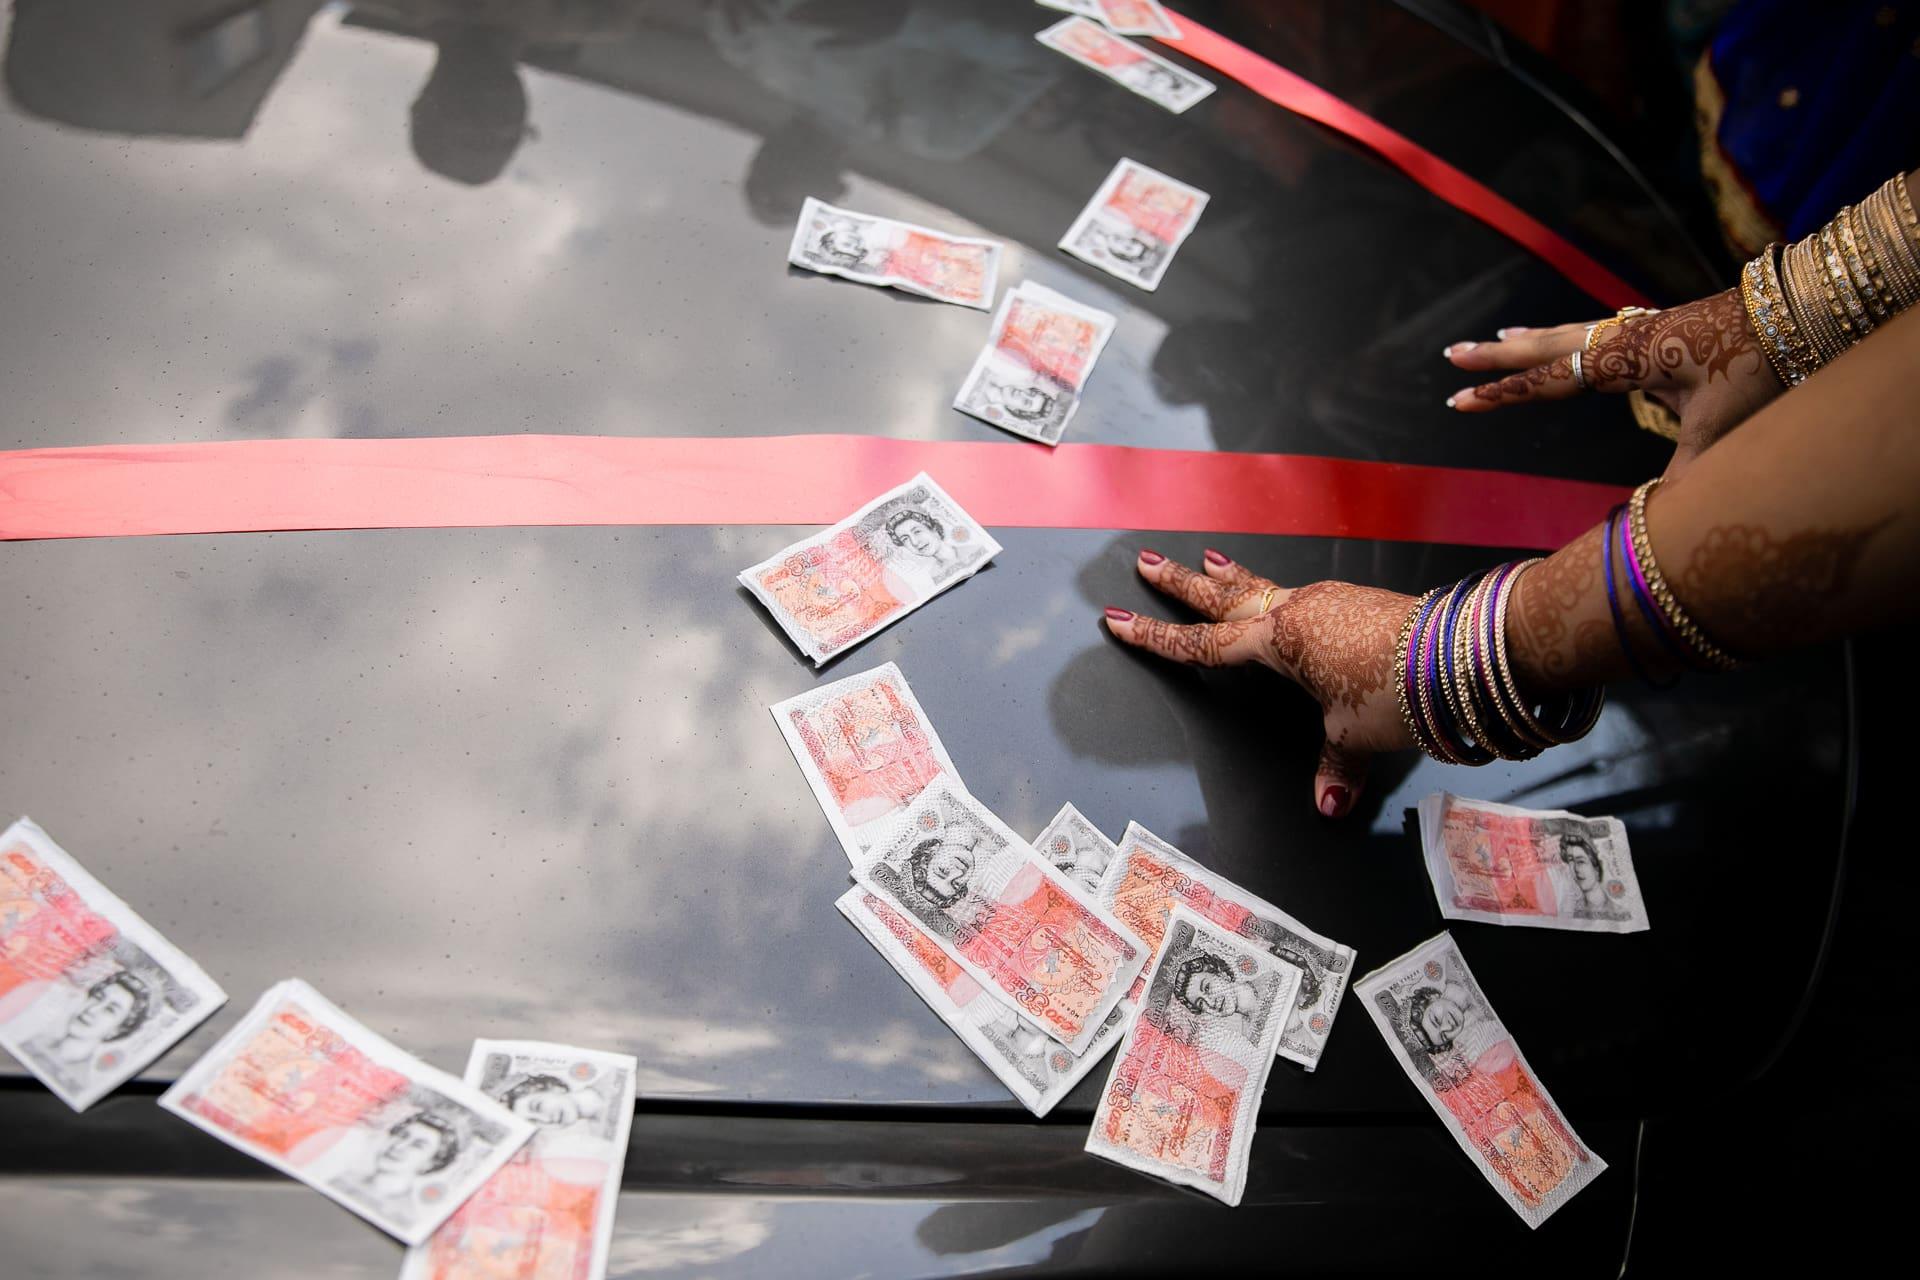 Money on the car